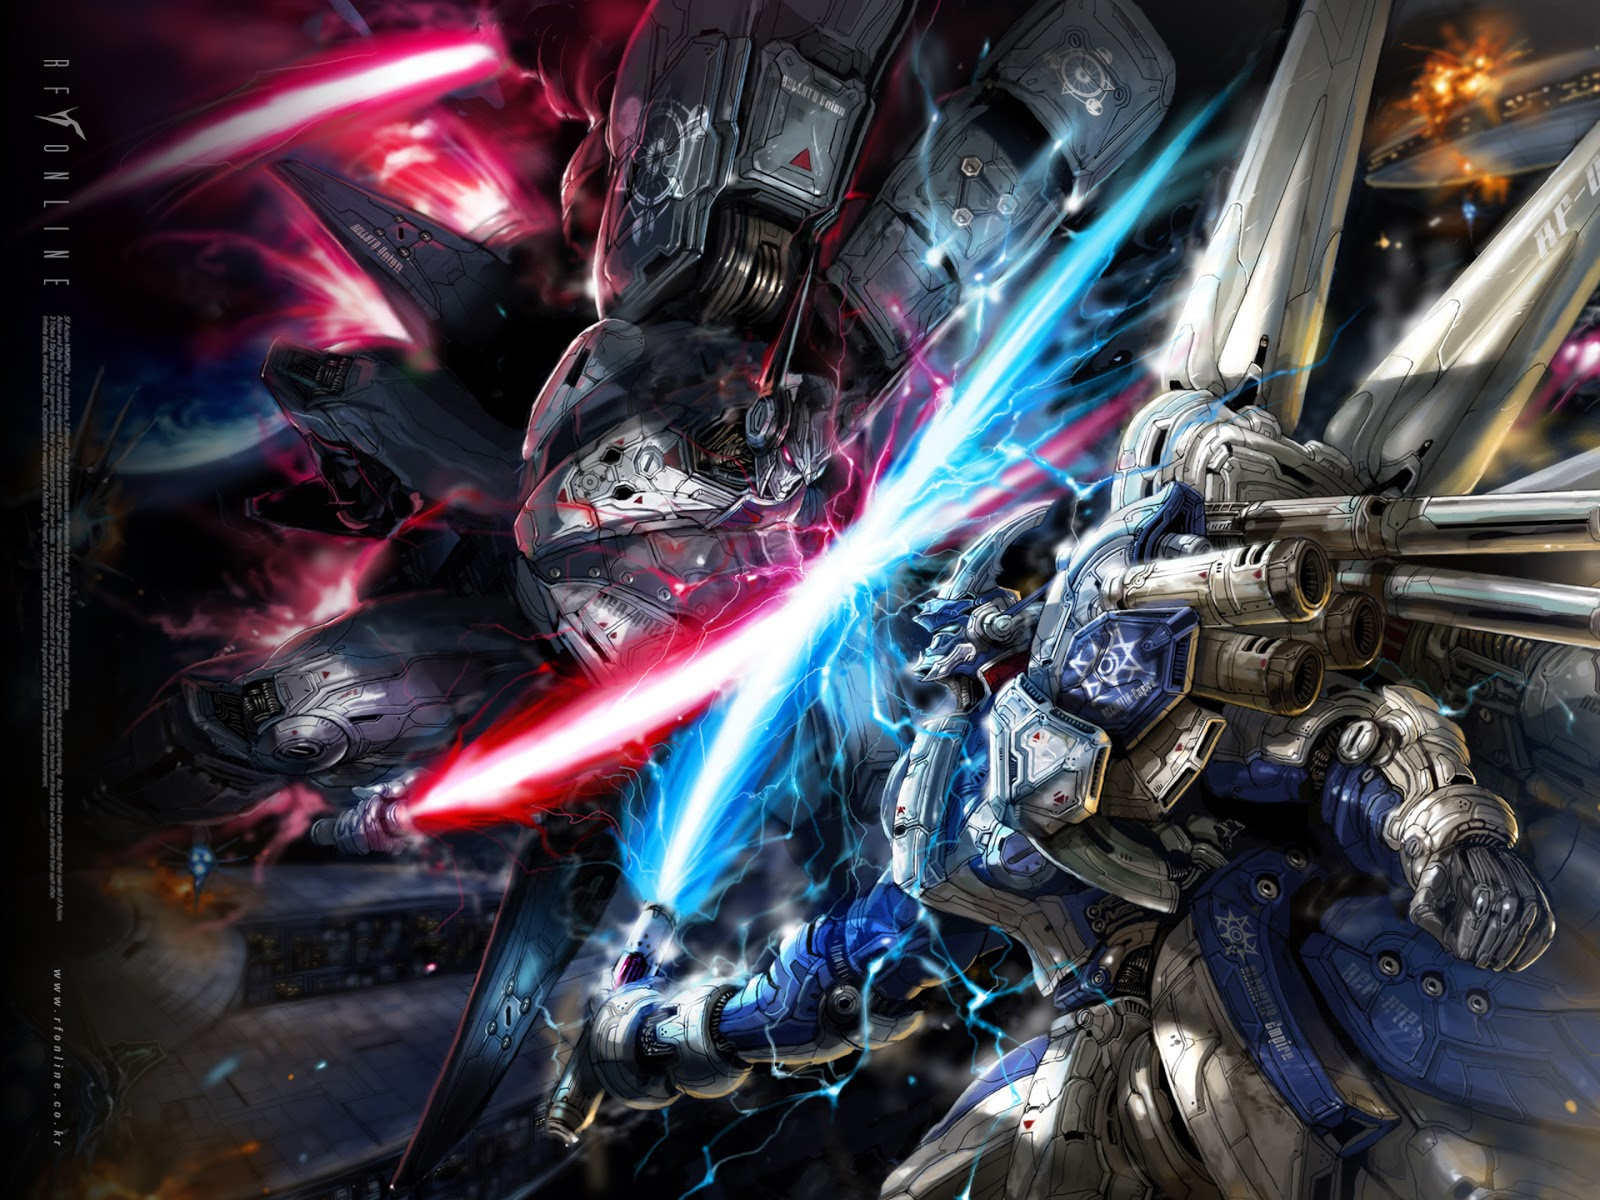 Gundam Mecha Robot Fighting Laser Sword Anime HD Wallpaper Desktop PC 1600x1200